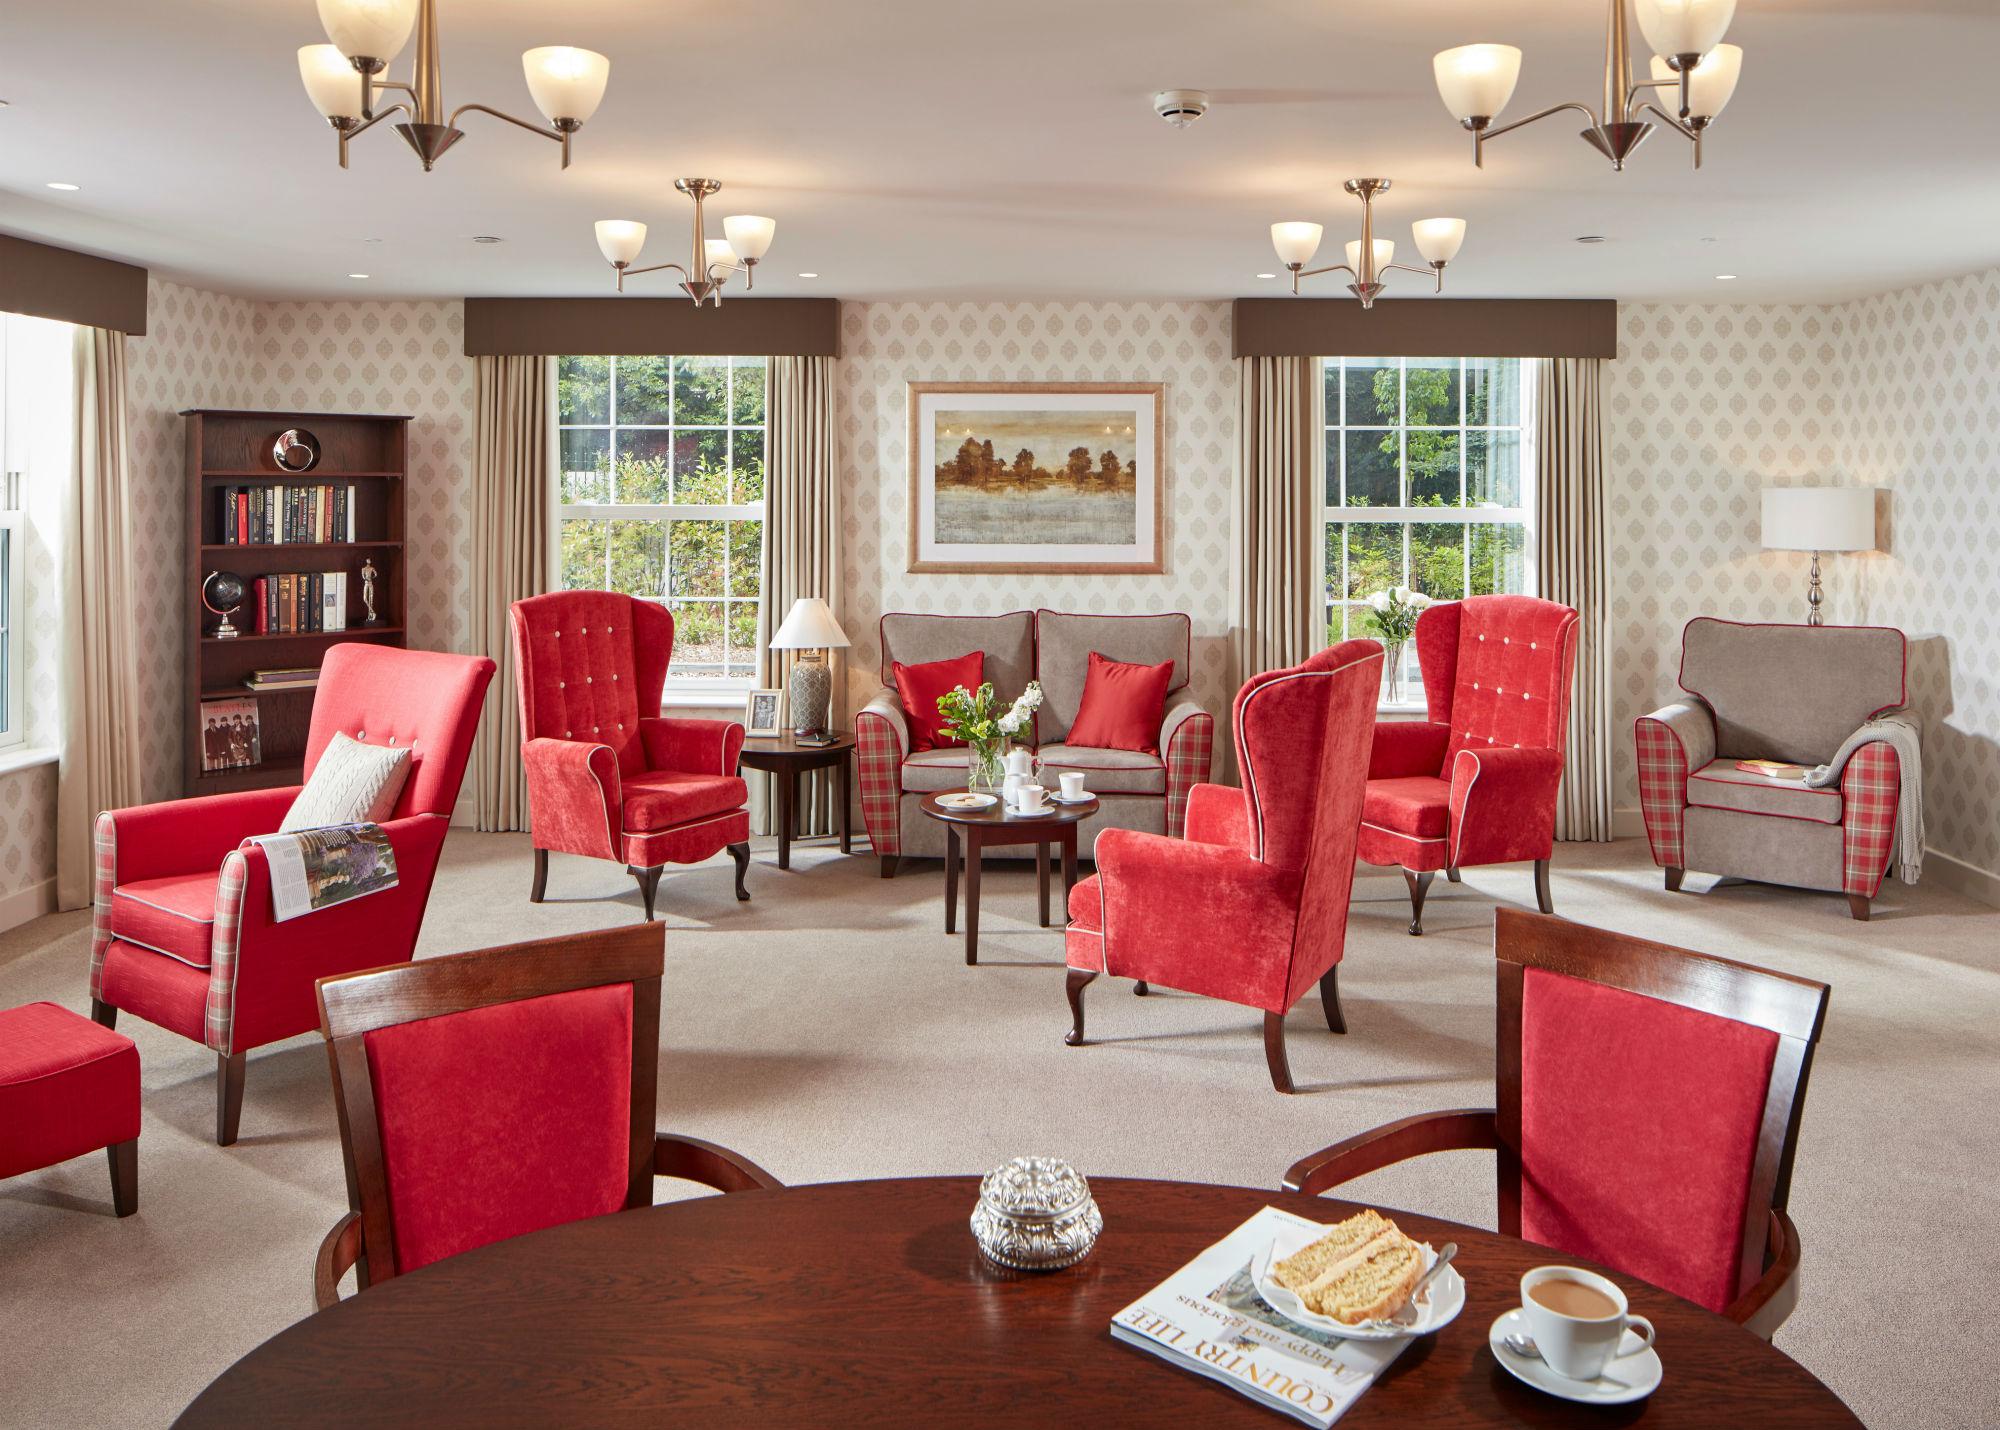 Homesmiths Dementia Friendly Design In Dorset The